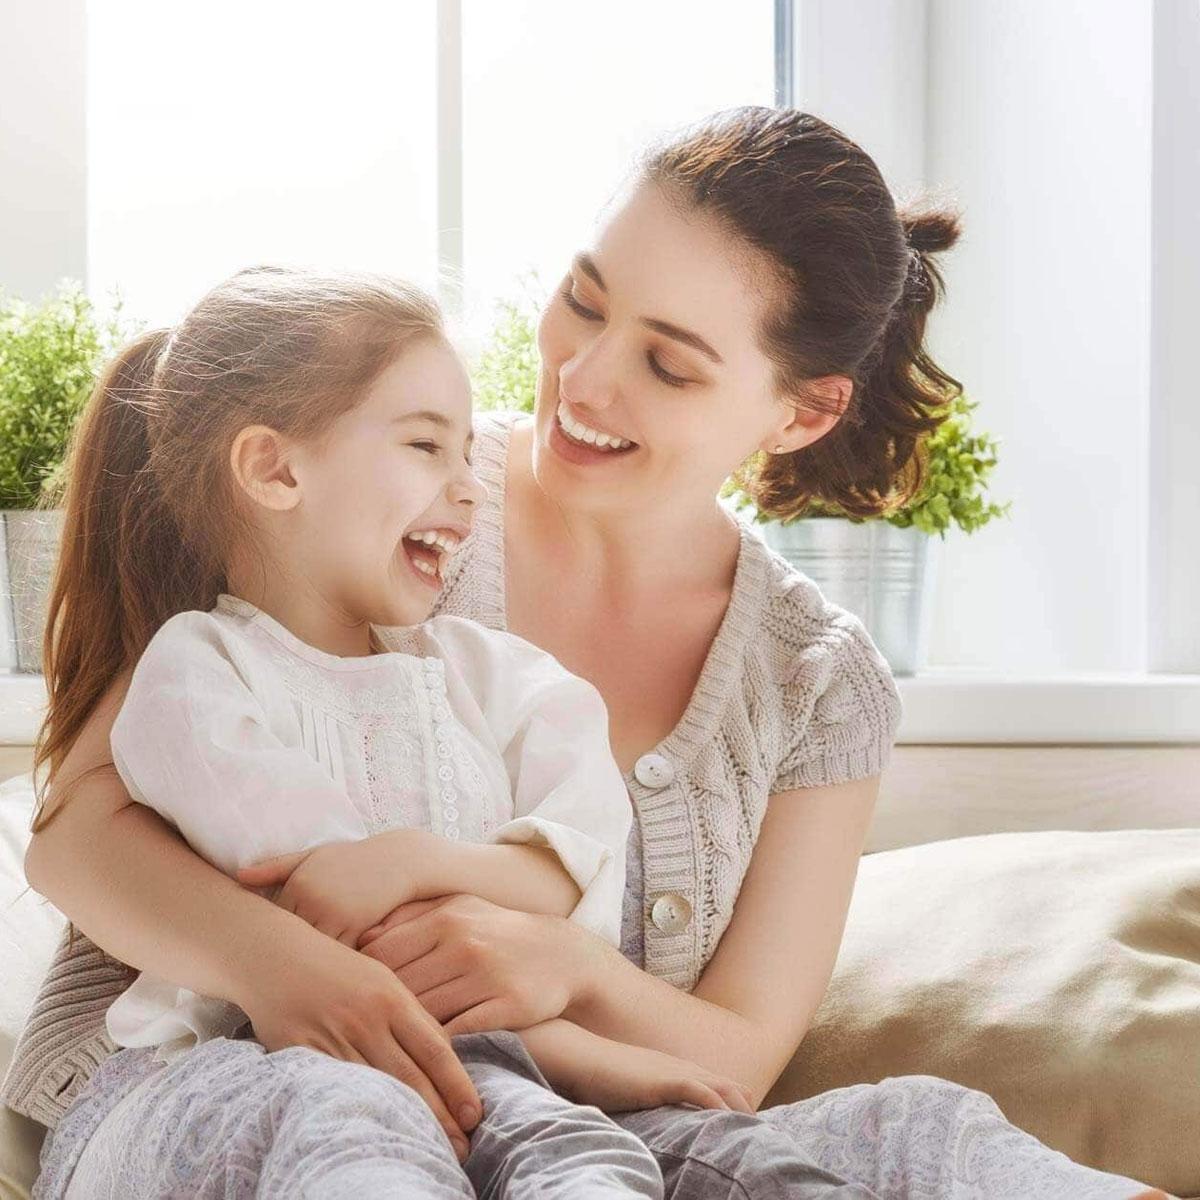 mother-hugging-happy-child